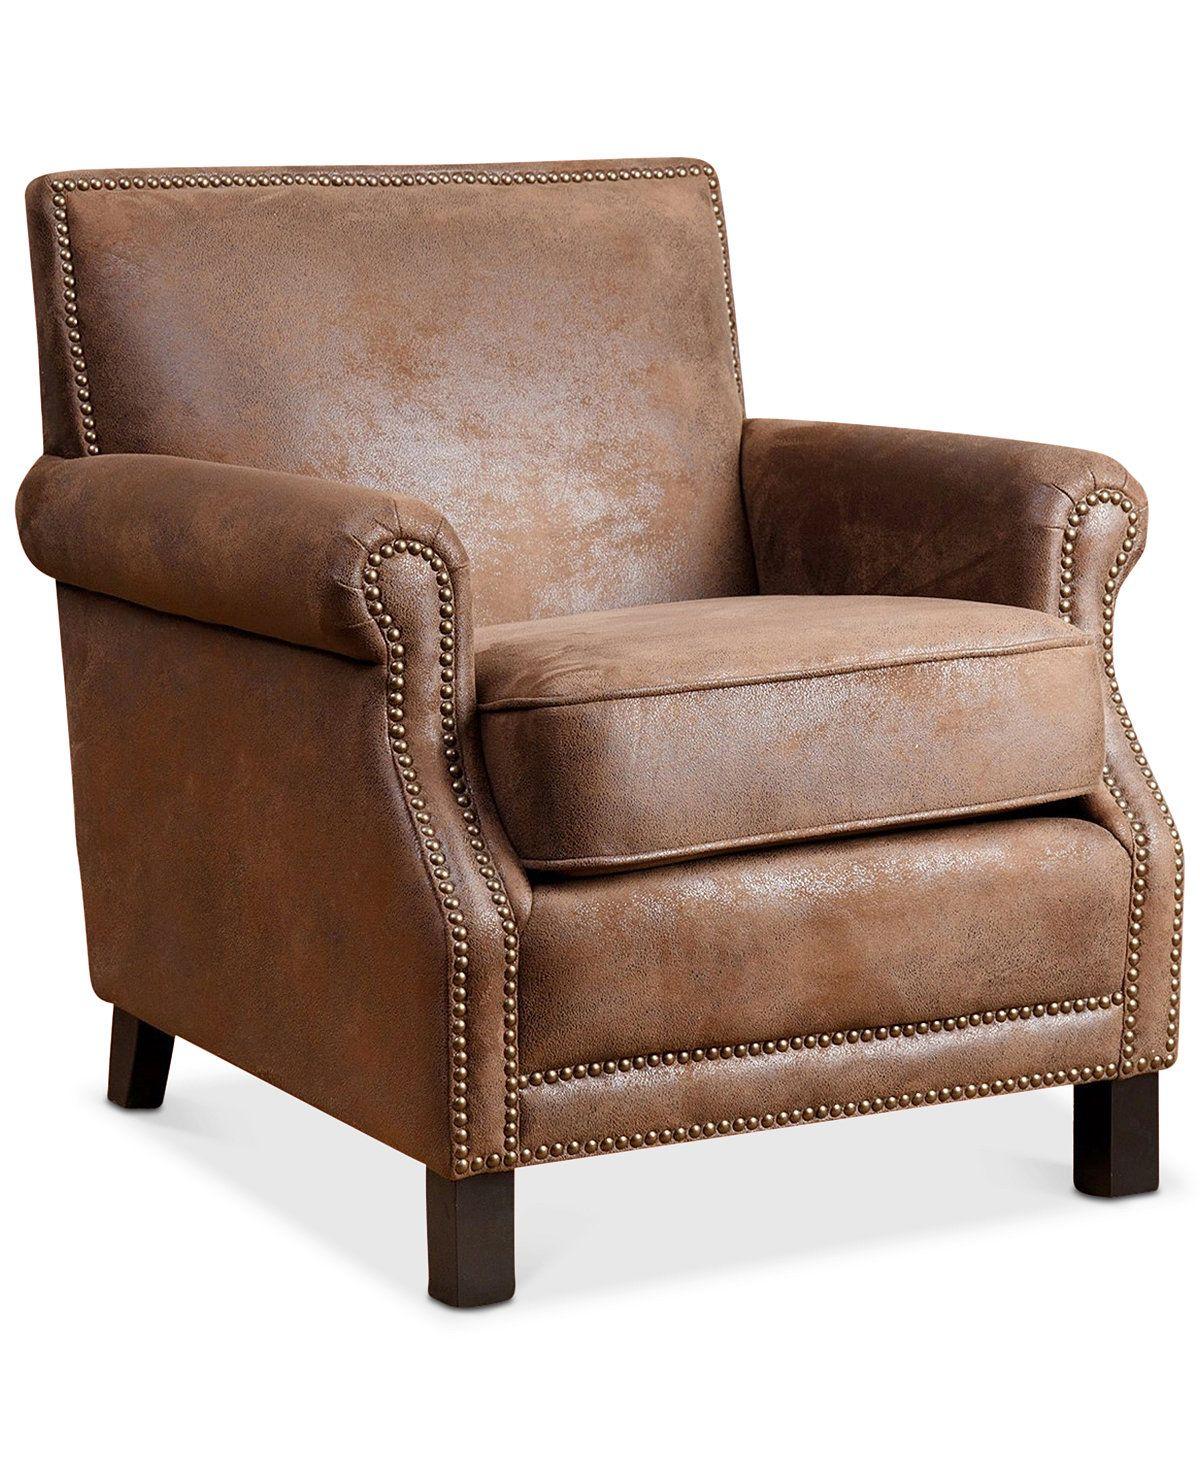 Prime Polton Club Chair Quick Ship Condo Living In 2019 Inzonedesignstudio Interior Chair Design Inzonedesignstudiocom